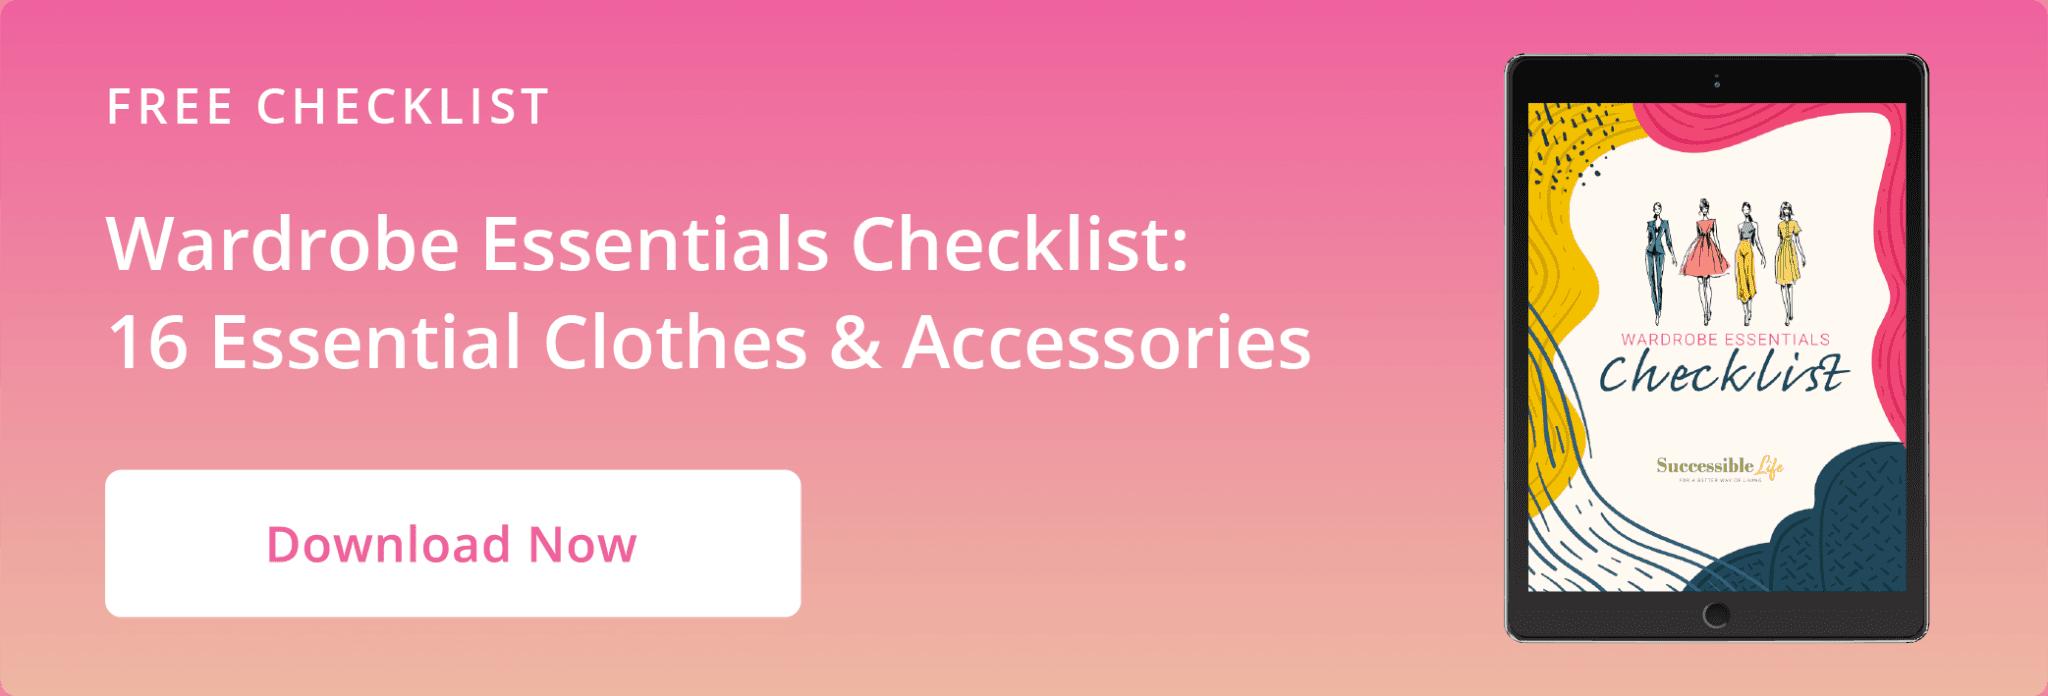 Article CTA Graphic - Wardrobe Essentials Checklist